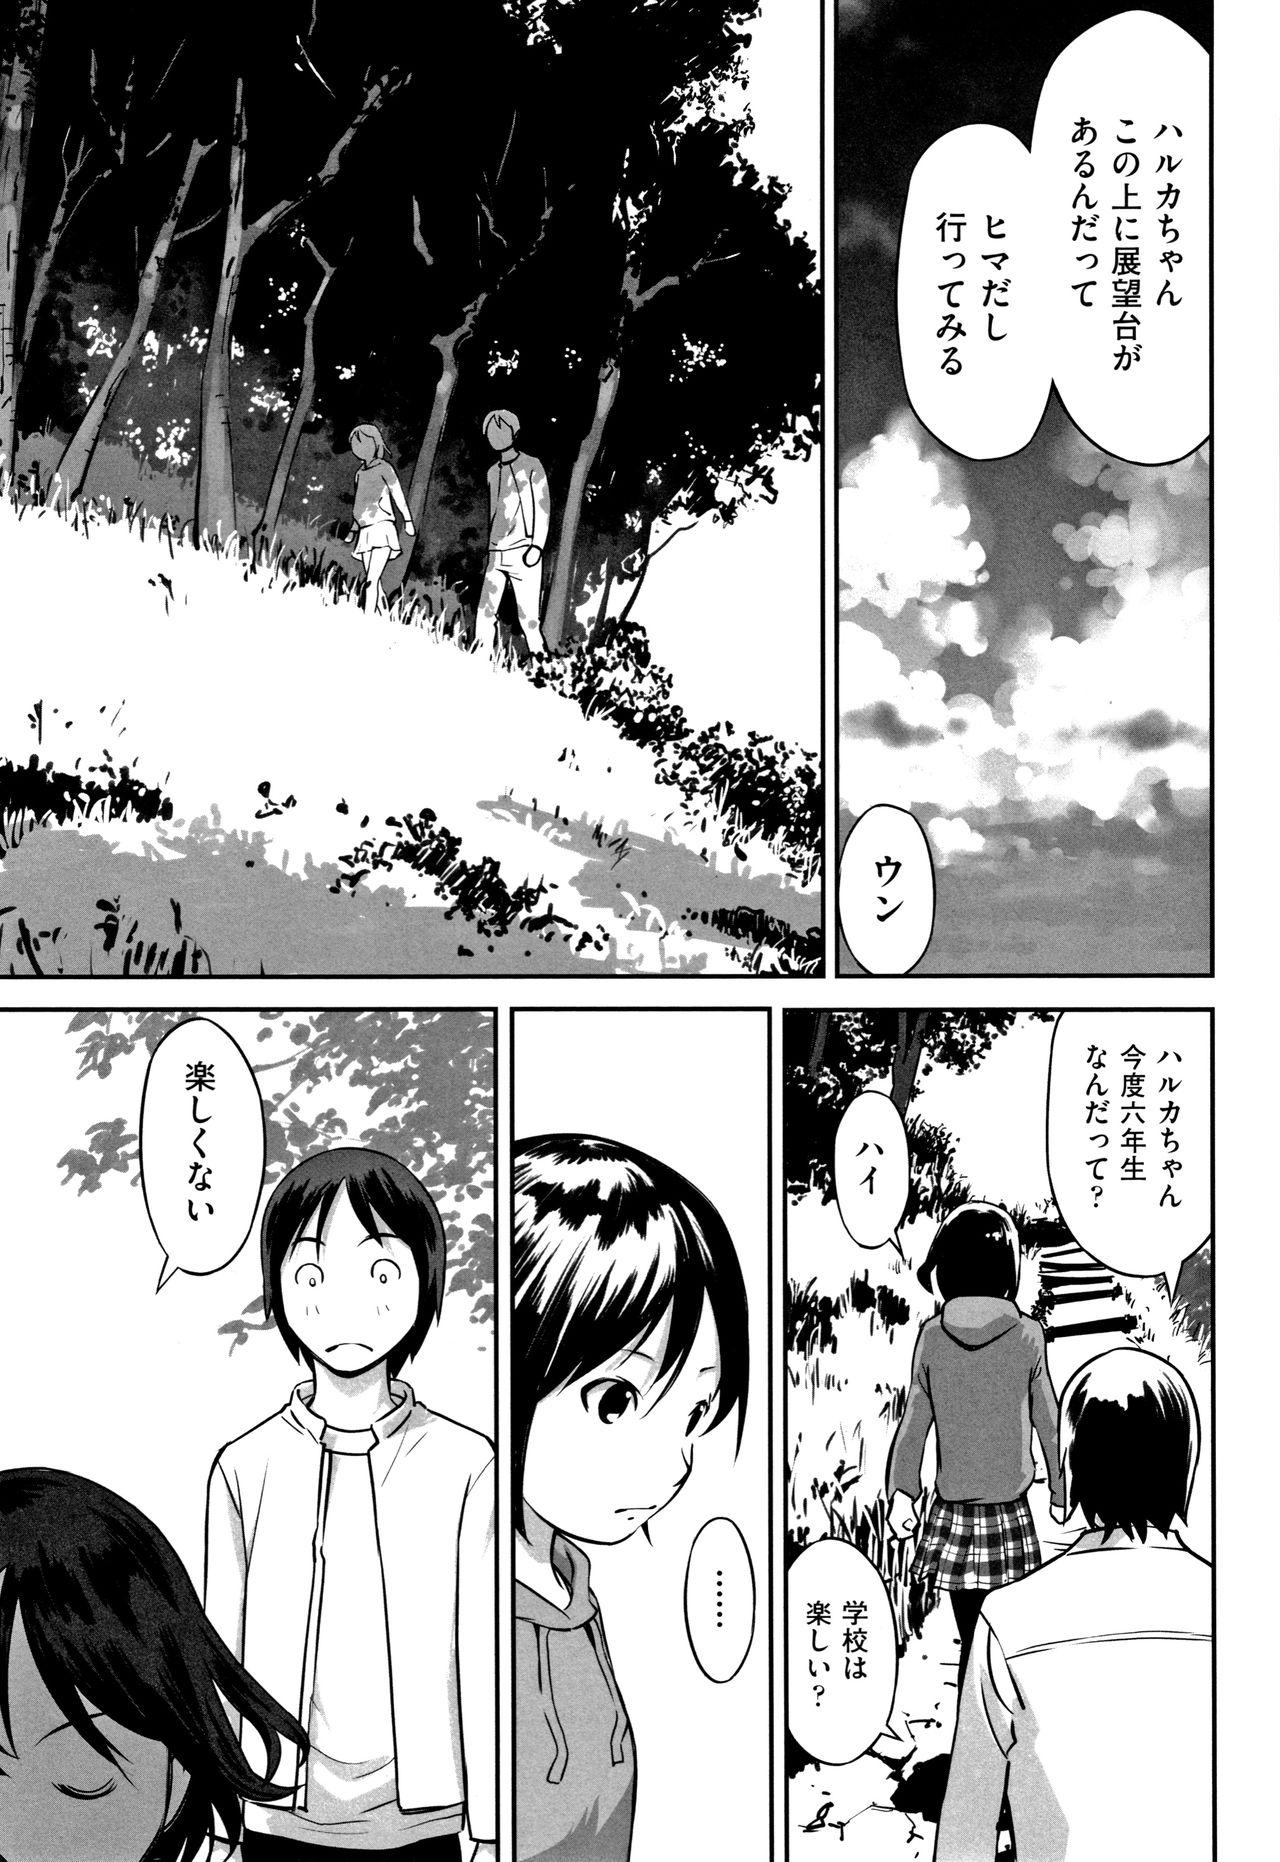 Shoujo Kumikyoku 11 163